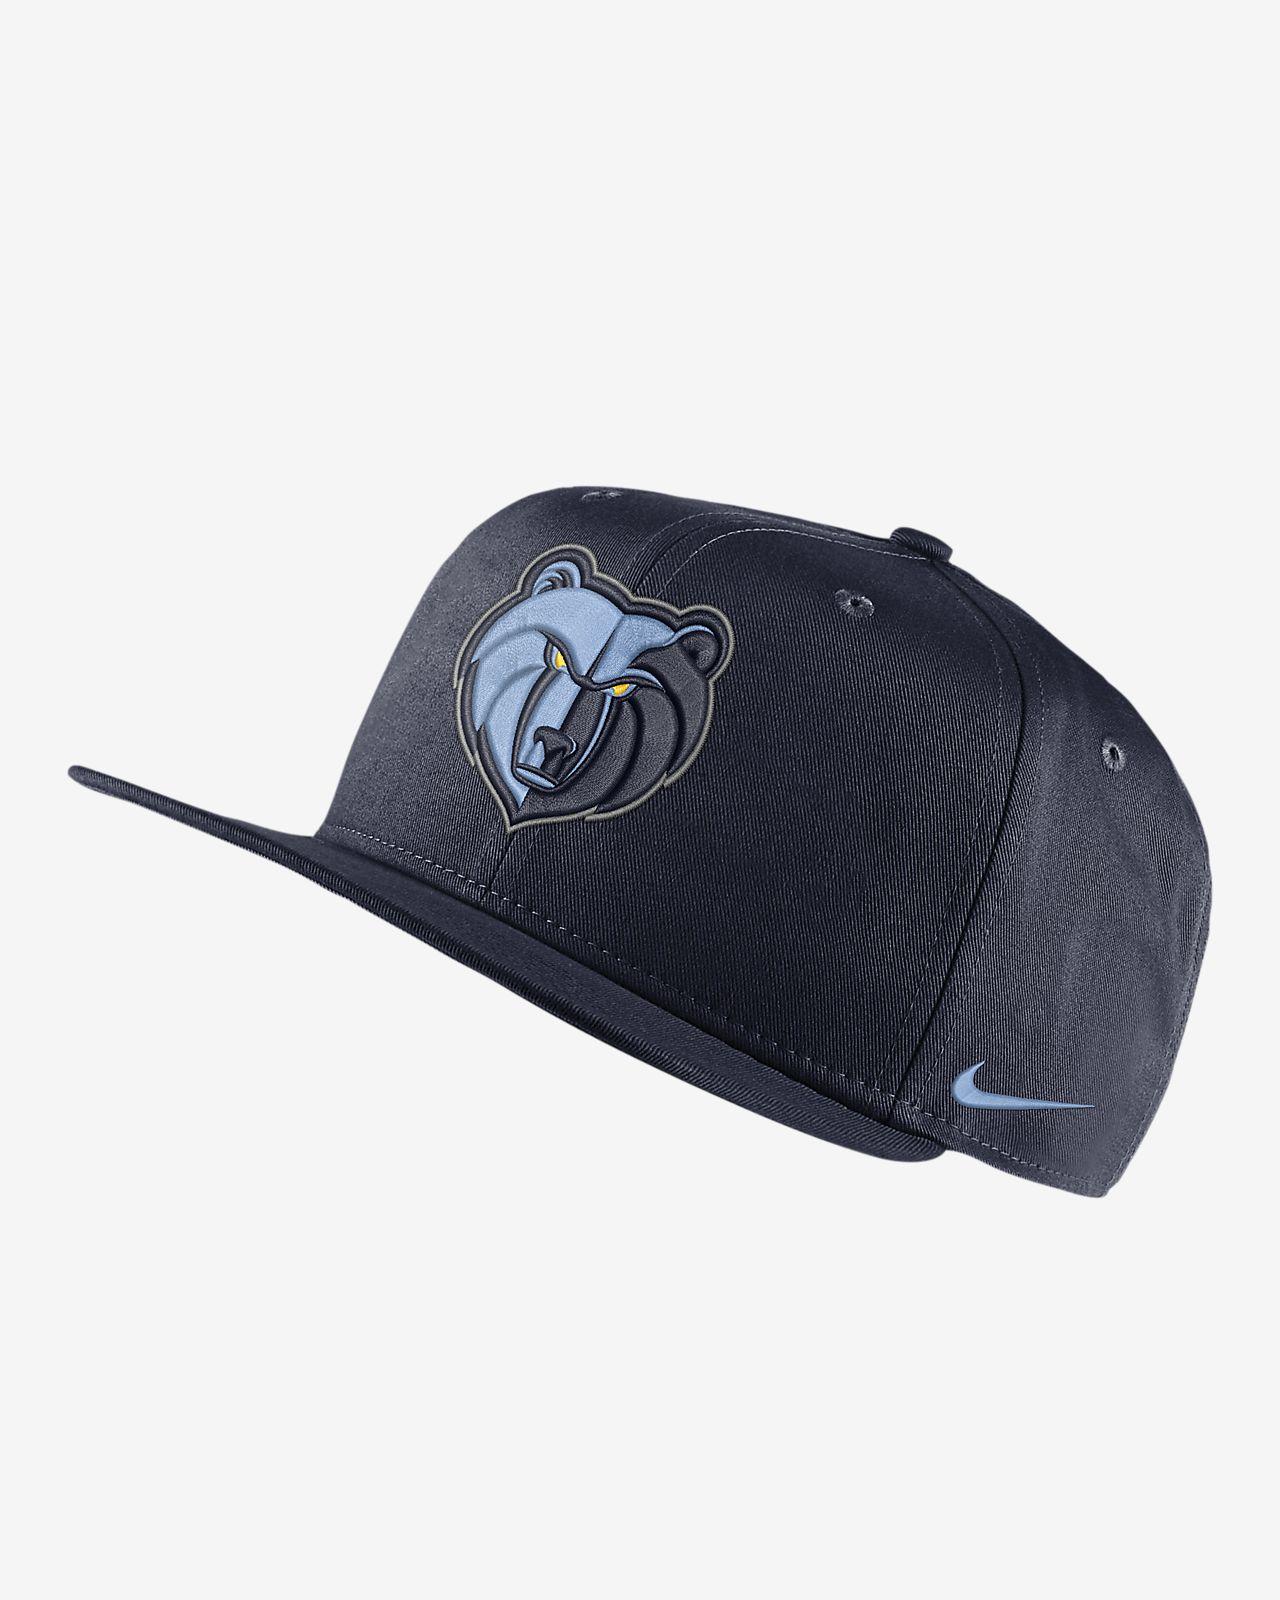 Memphis Grizzlies Nike Pro NBA Cap